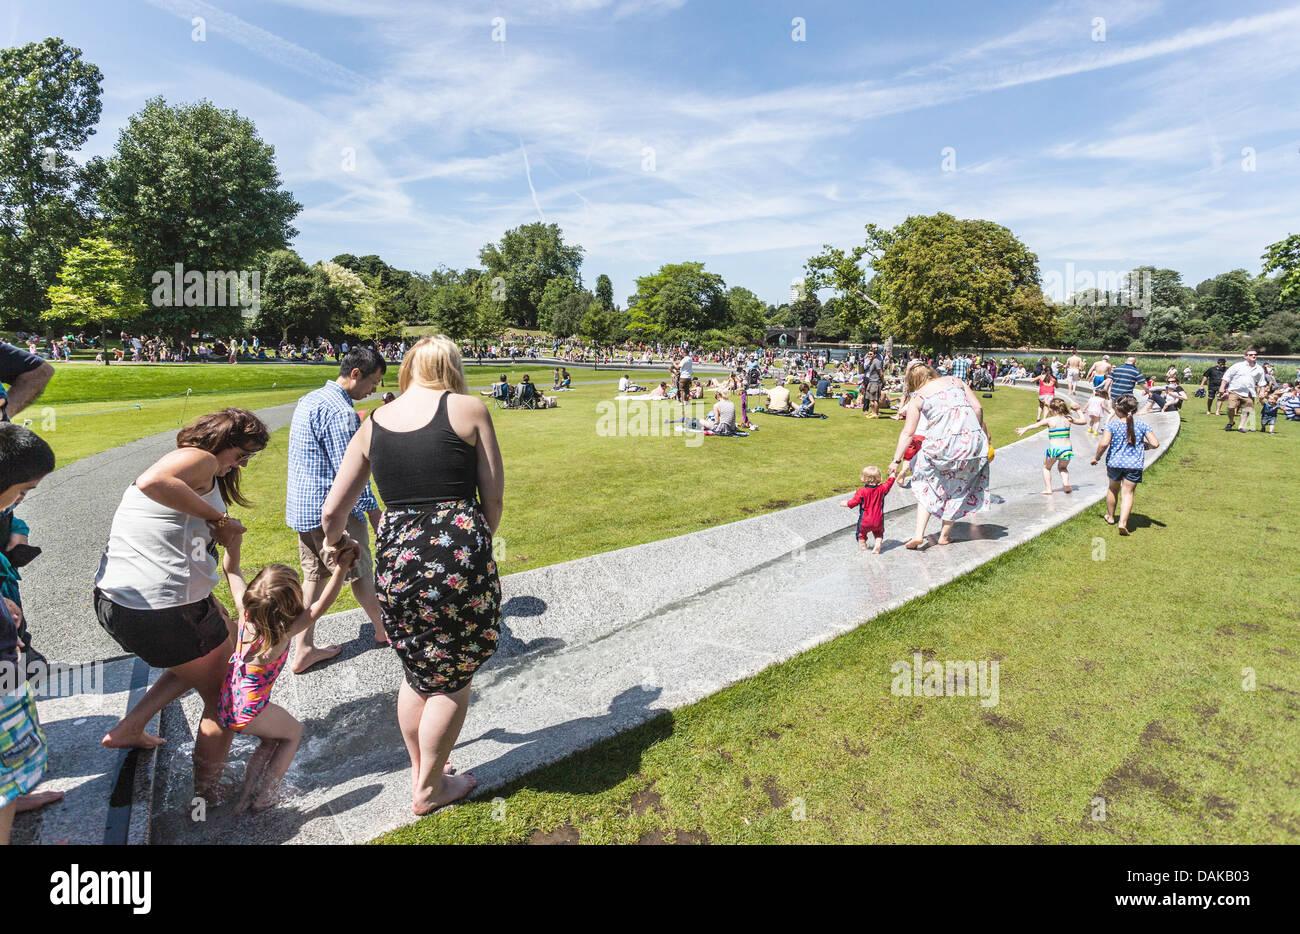 People enjoying summer  at Princess Diana Memorial Fountain, Hyde Park, London, England, UK - Stock Image